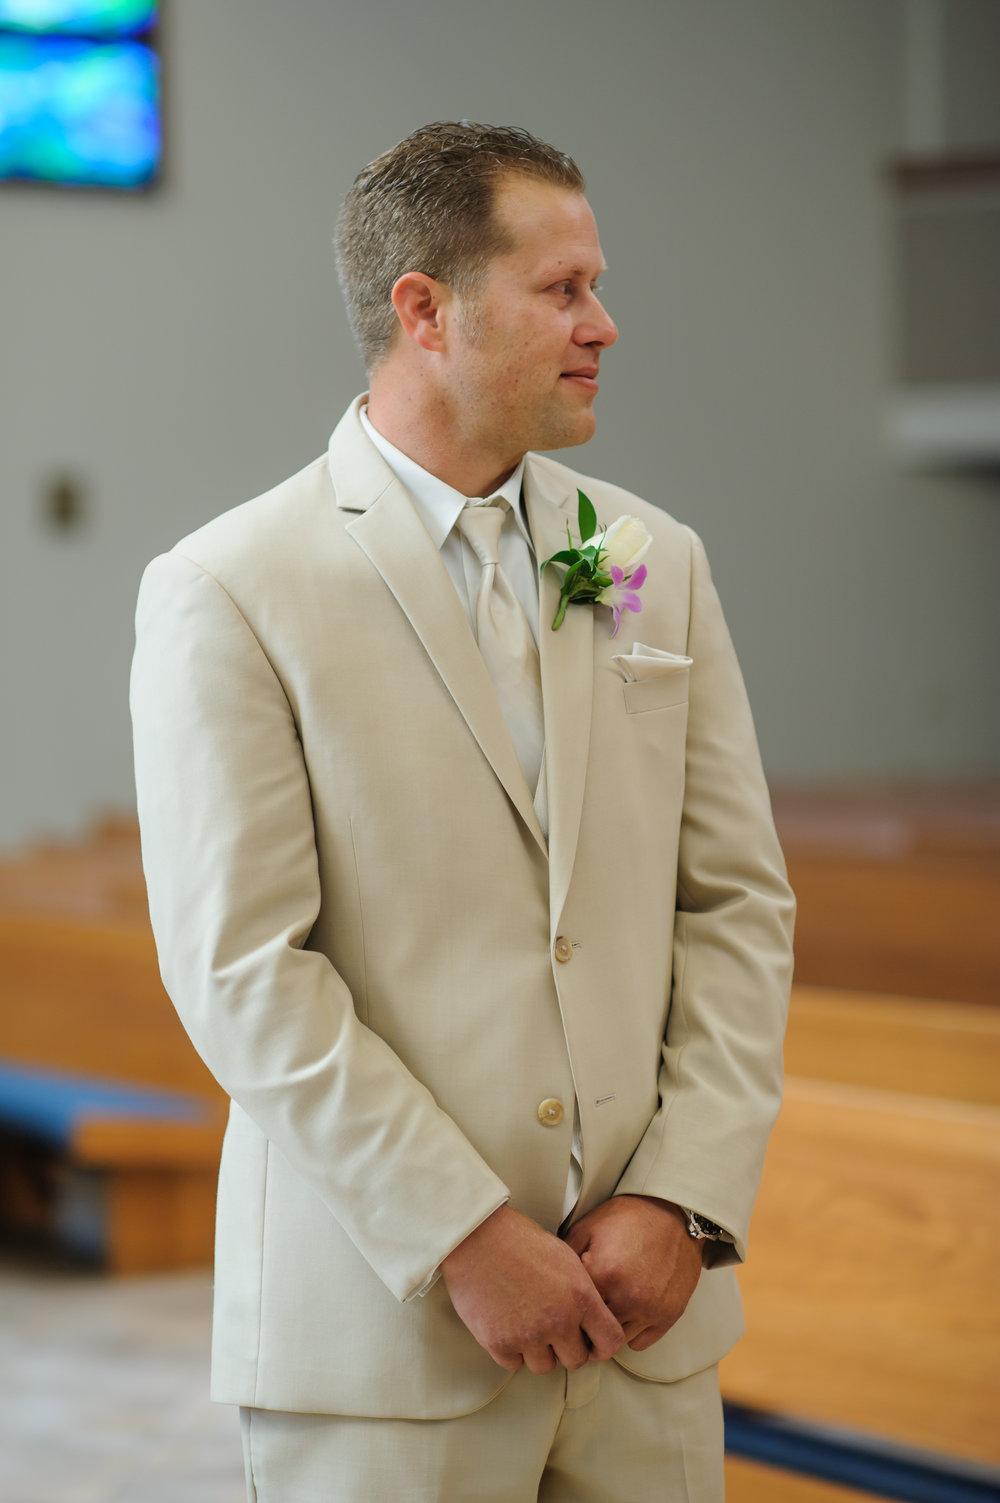 danielle-ross-001-sacramento-wedding-photographer-katherine-nicole-photography.JPG